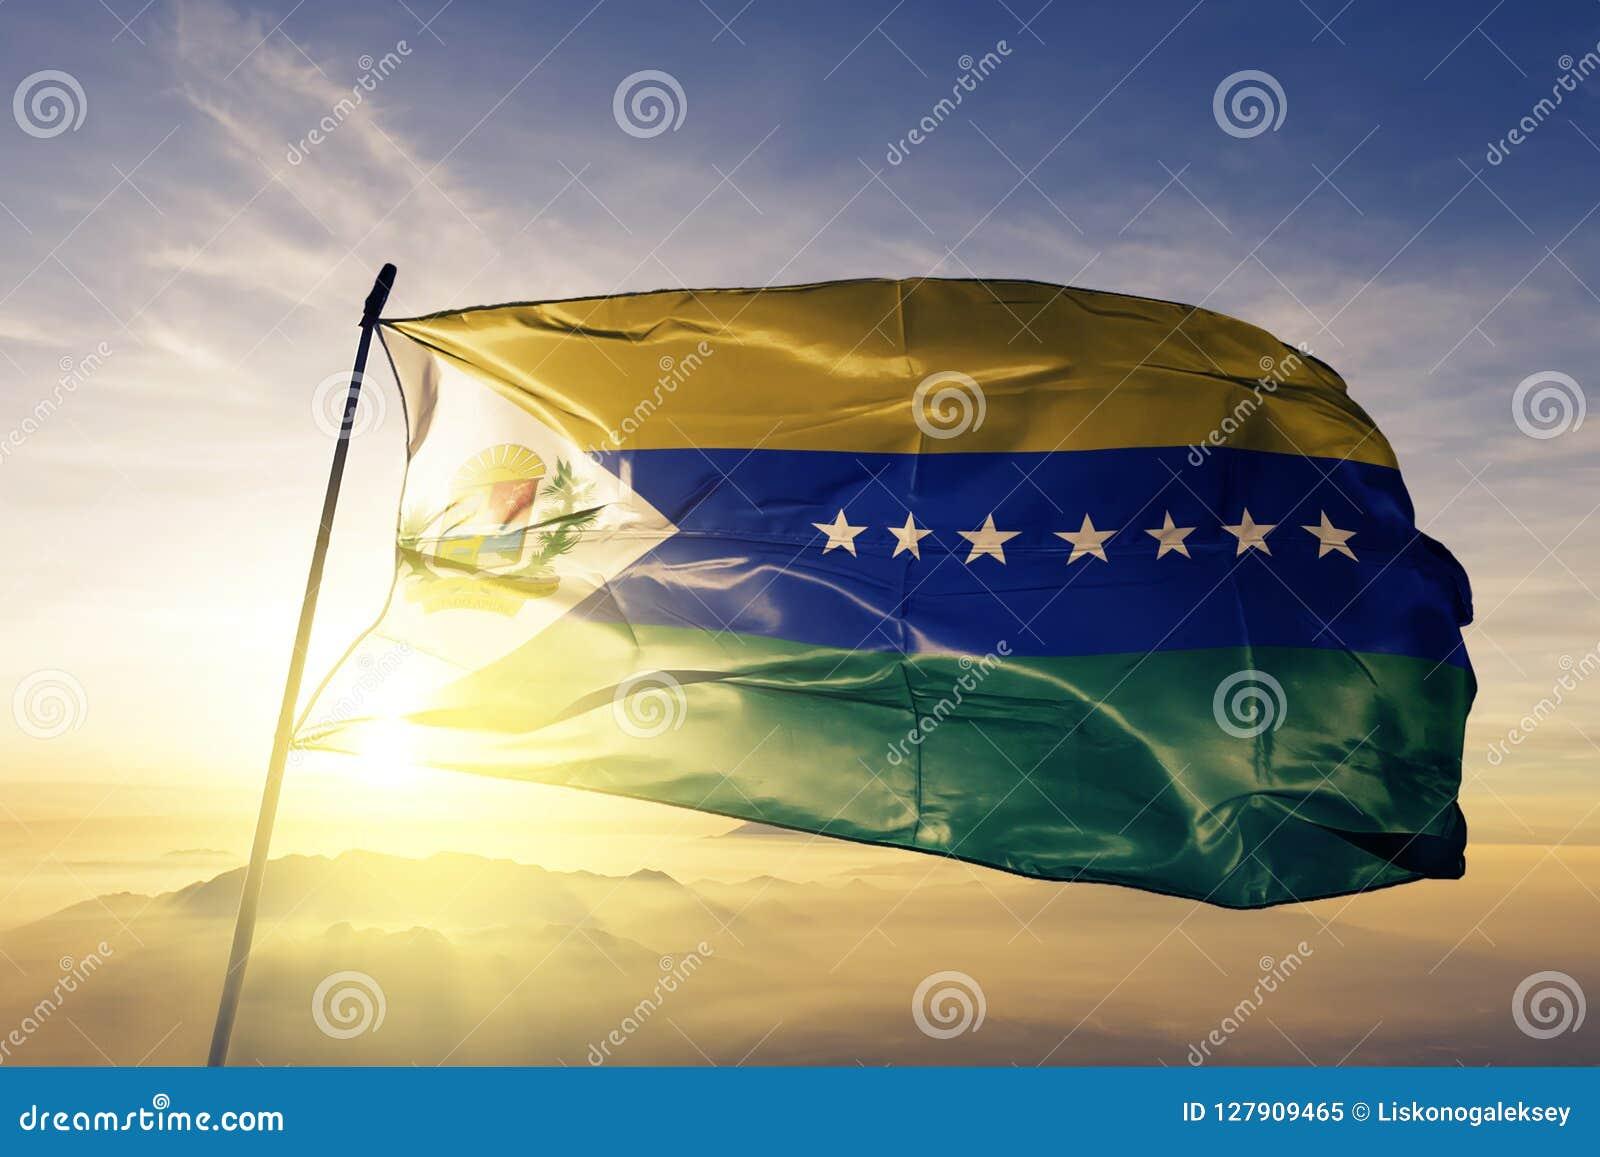 Apure State of Venezuela flag textile cloth fabric waving on the top sunrise mist fog